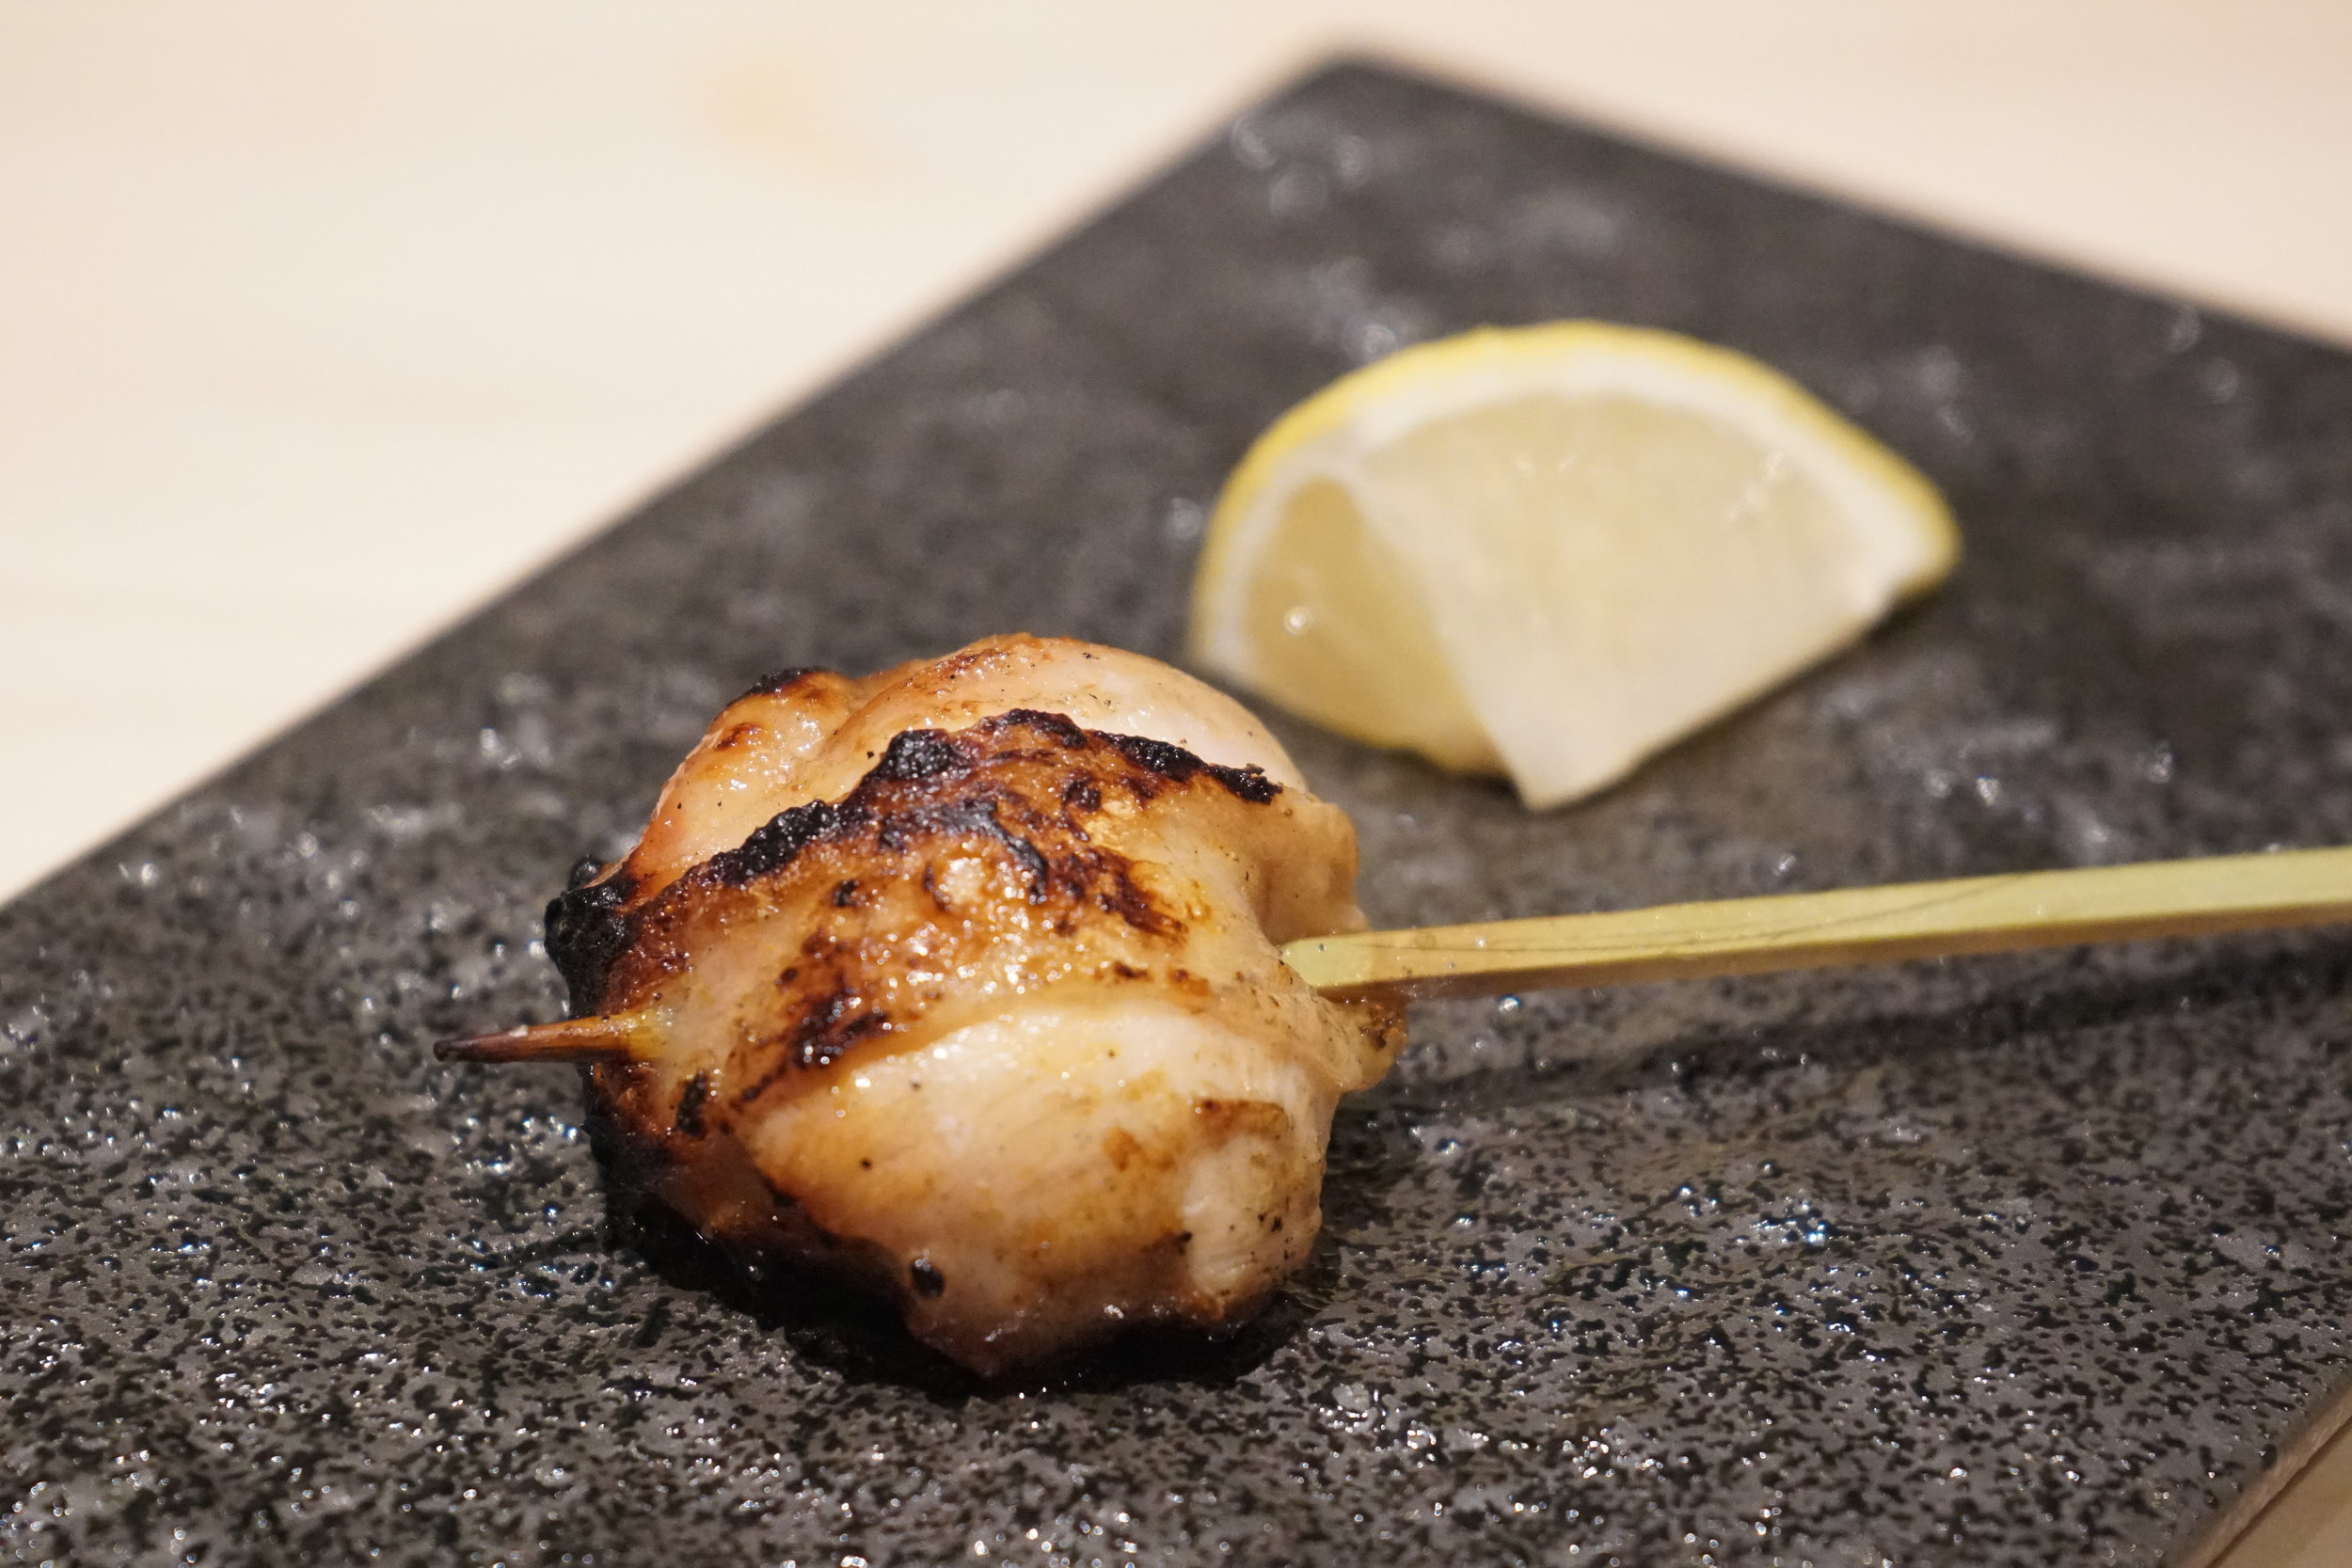 Chicken Oyster Yakitori with Lemon at Shuraku in New York City